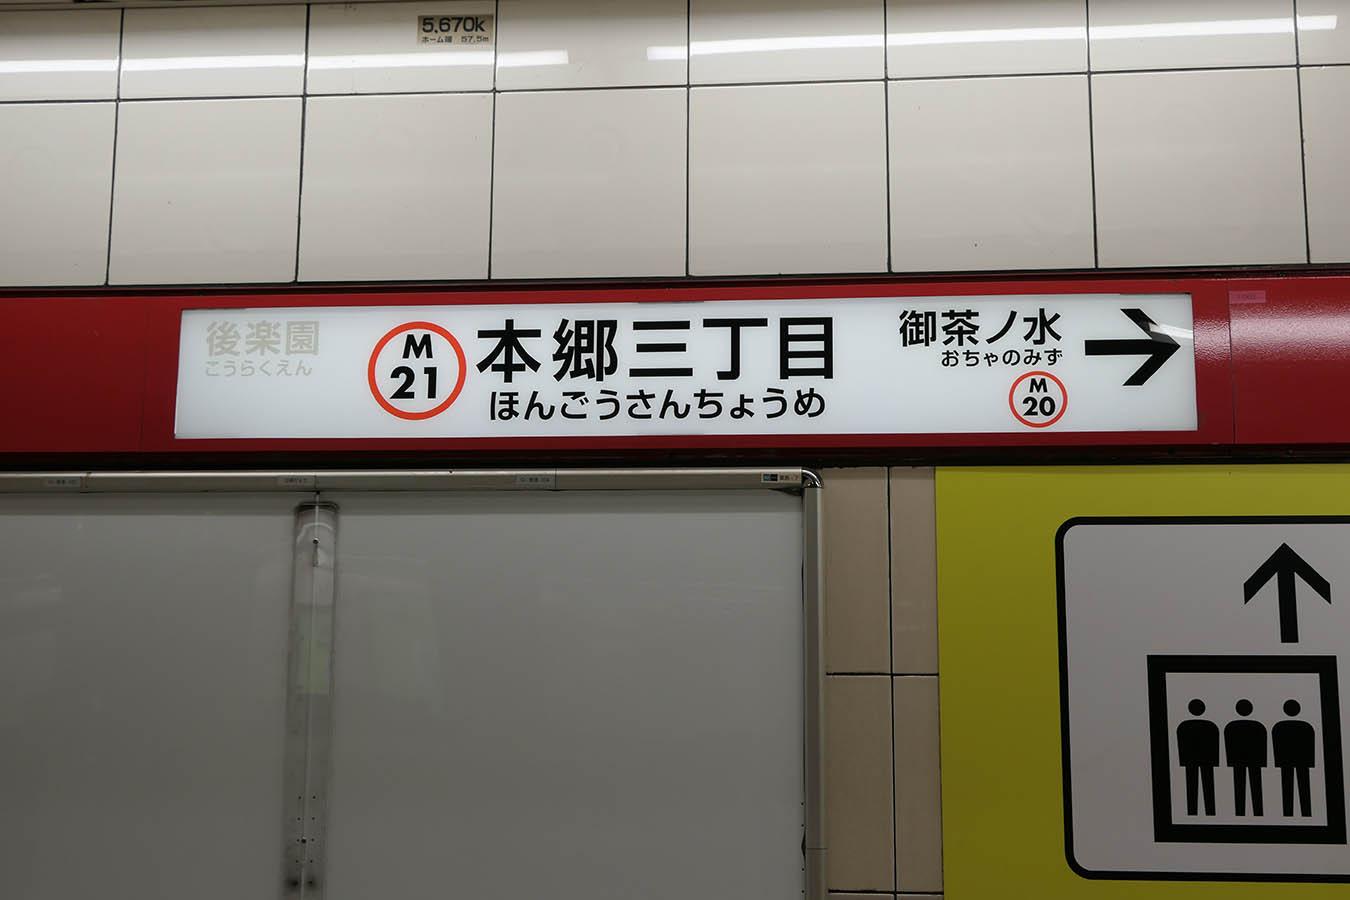 M21_photo05.jpg